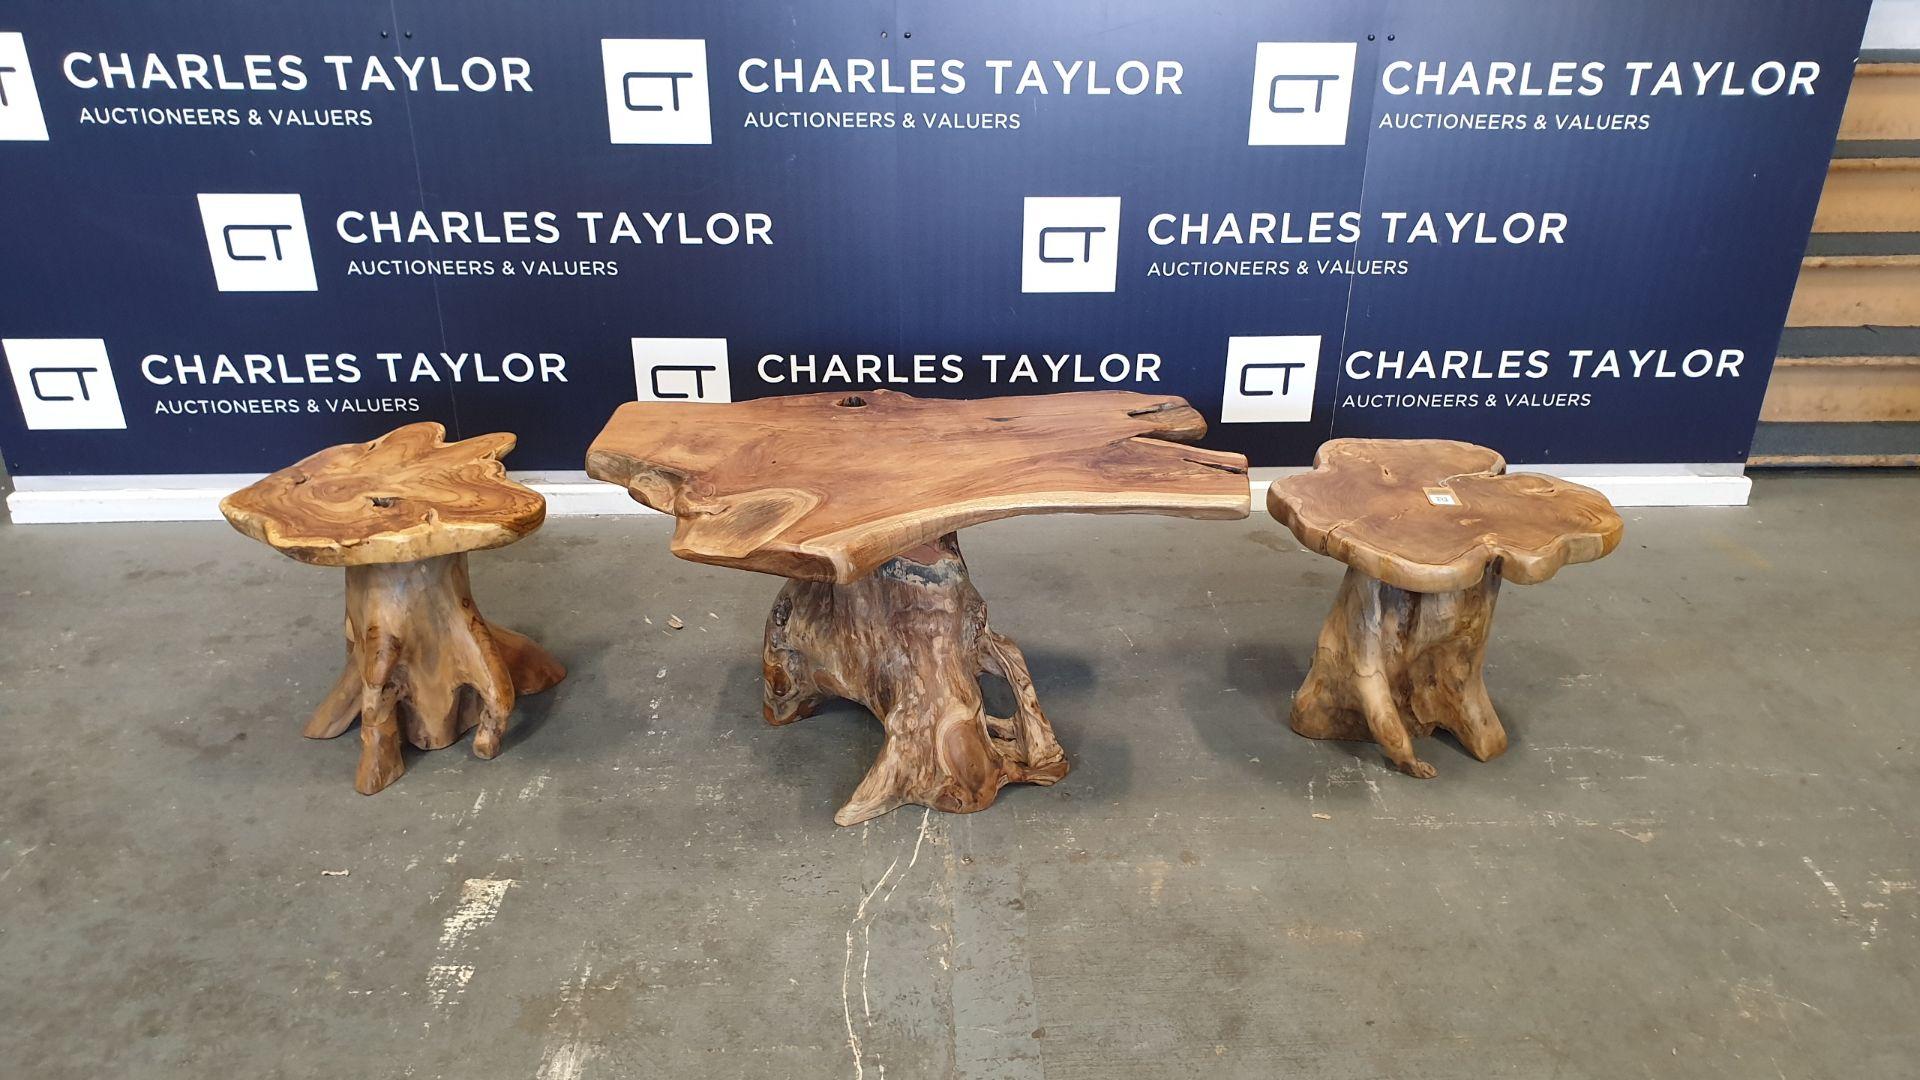 Lot 51 - BRAND NEW SOLID TEAK ROOT WOODEN MUSHROOM TABLE AND 2 X MUSHROOM STOOLS 55 X 65 X 100cm RRP £695